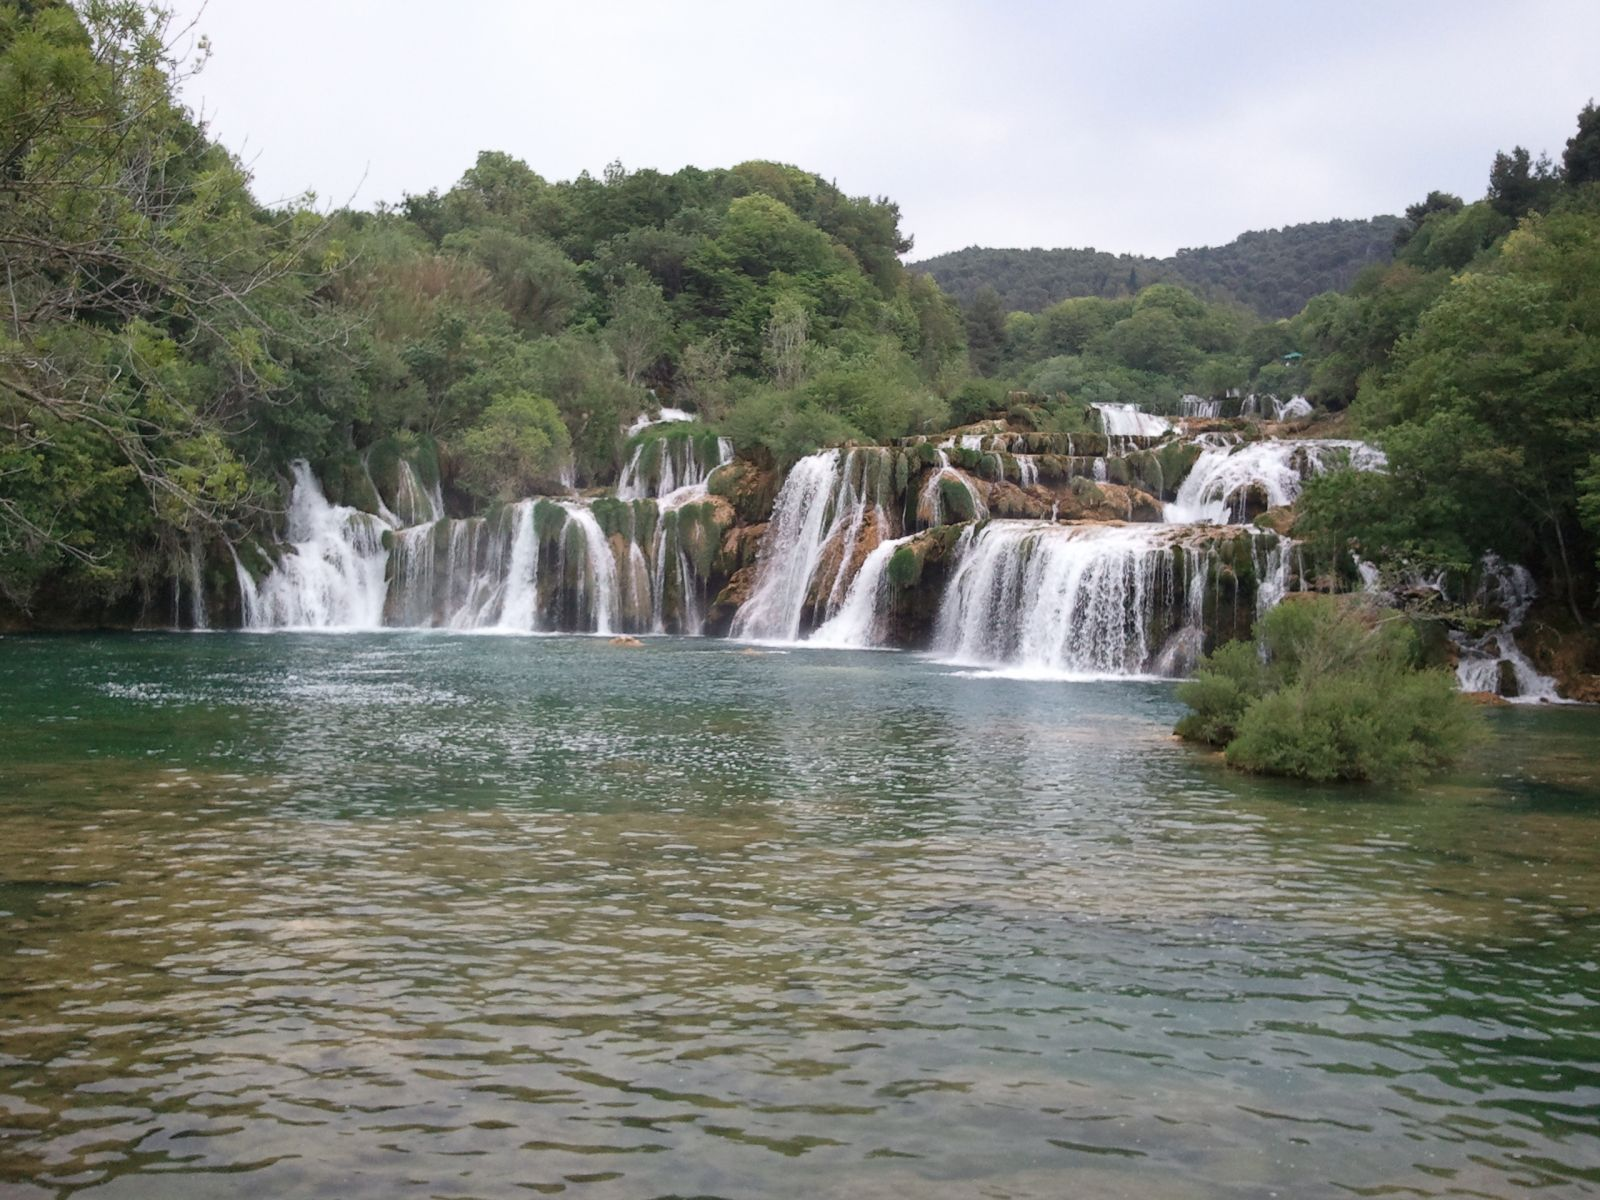 Najbolje od srednje i sjeverne Dalmacije: Nacionalni park Krka: slapovi Krke